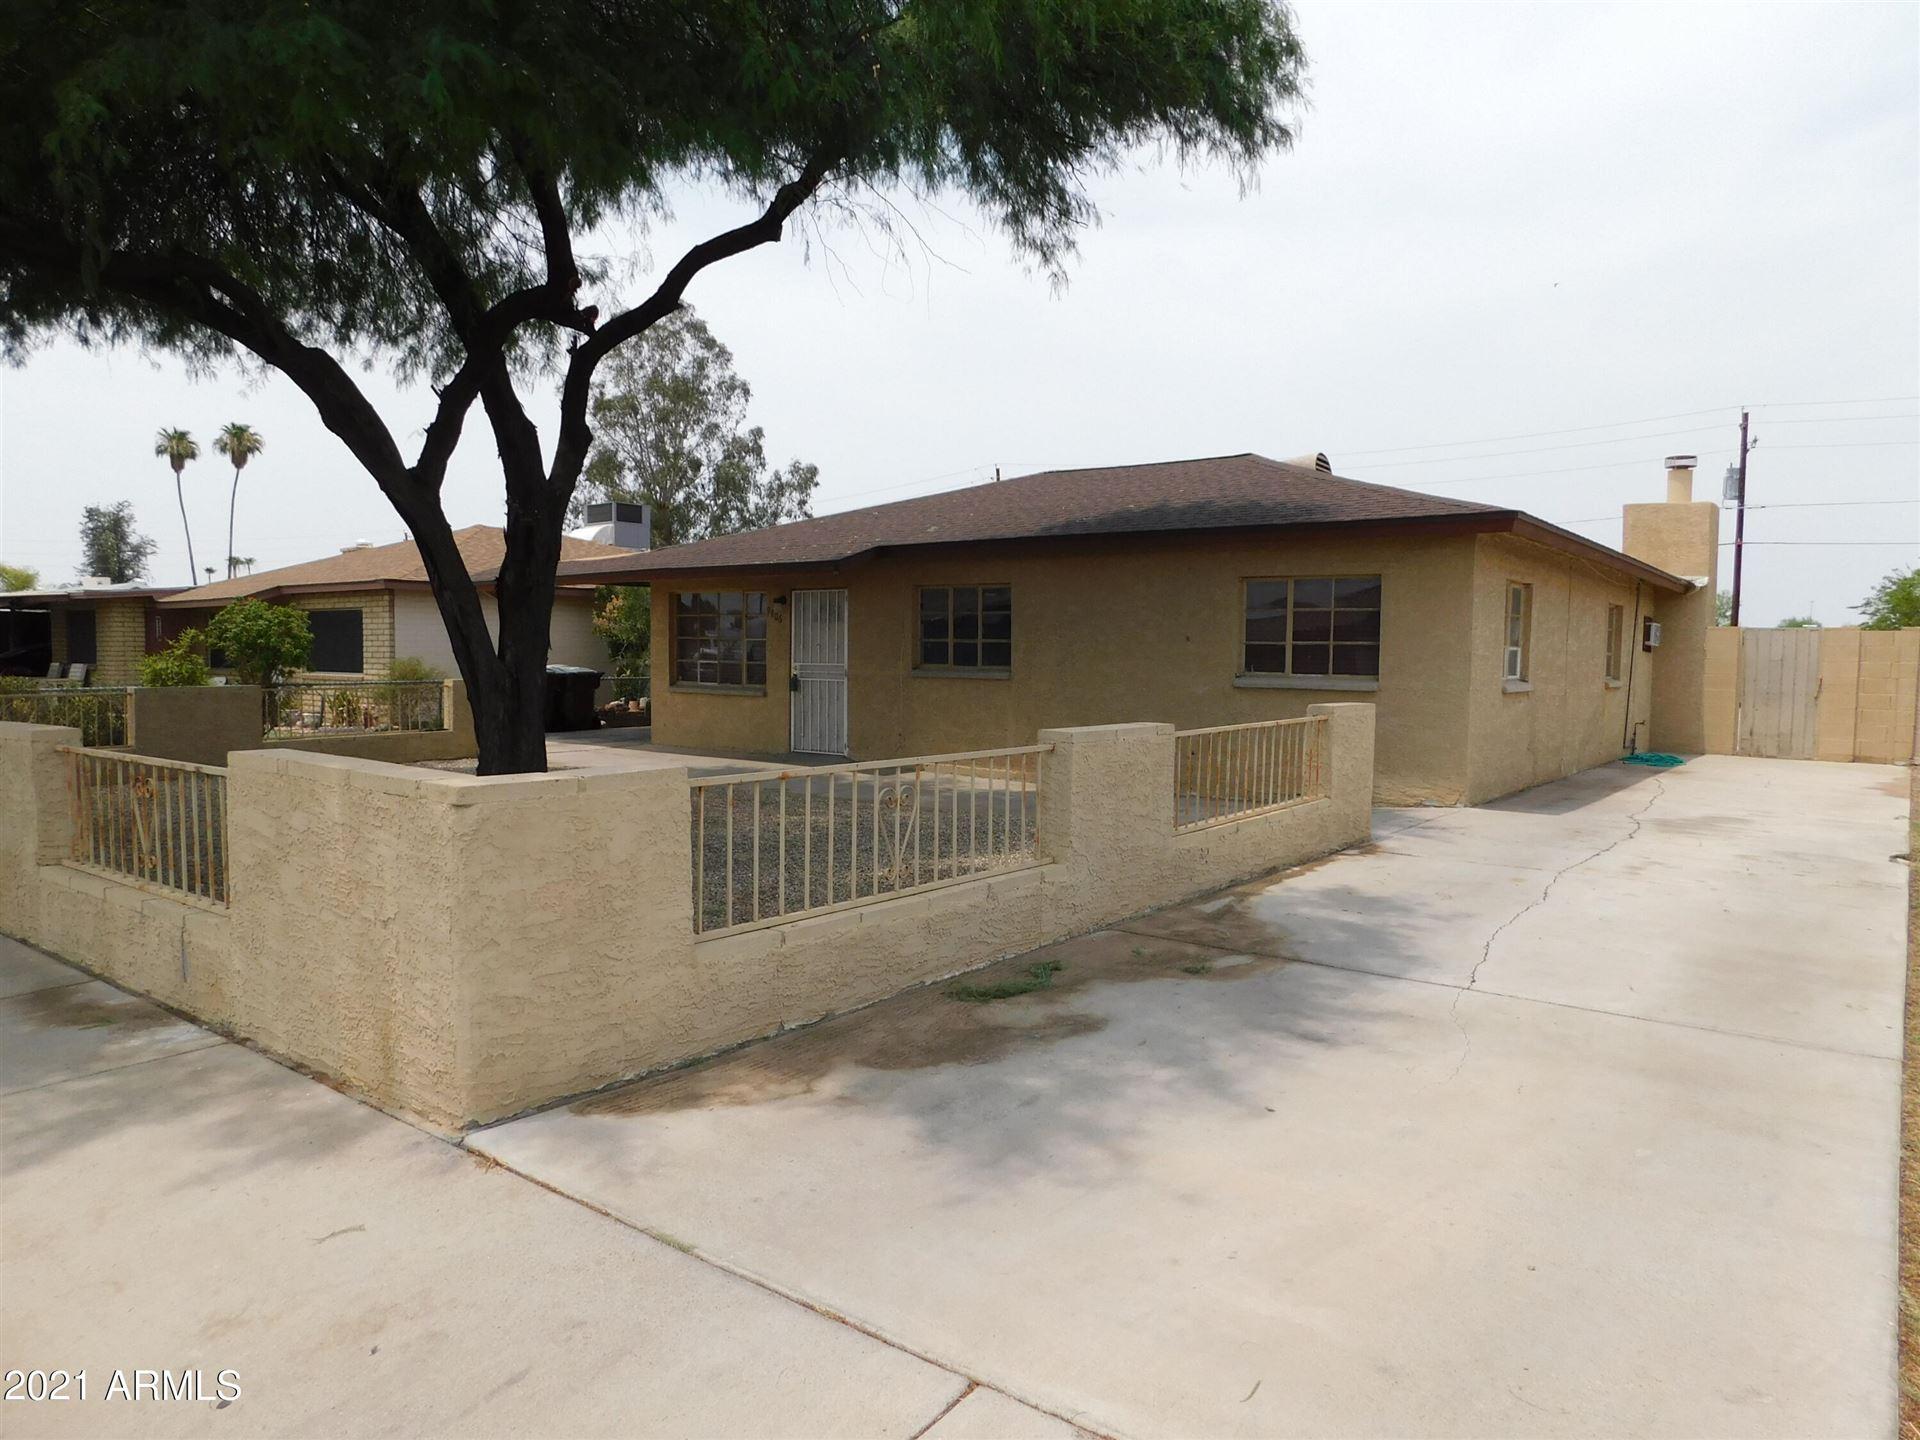 Photo of 9406 W FILLMORE Street, Tolleson, AZ 85353 (MLS # 6263948)